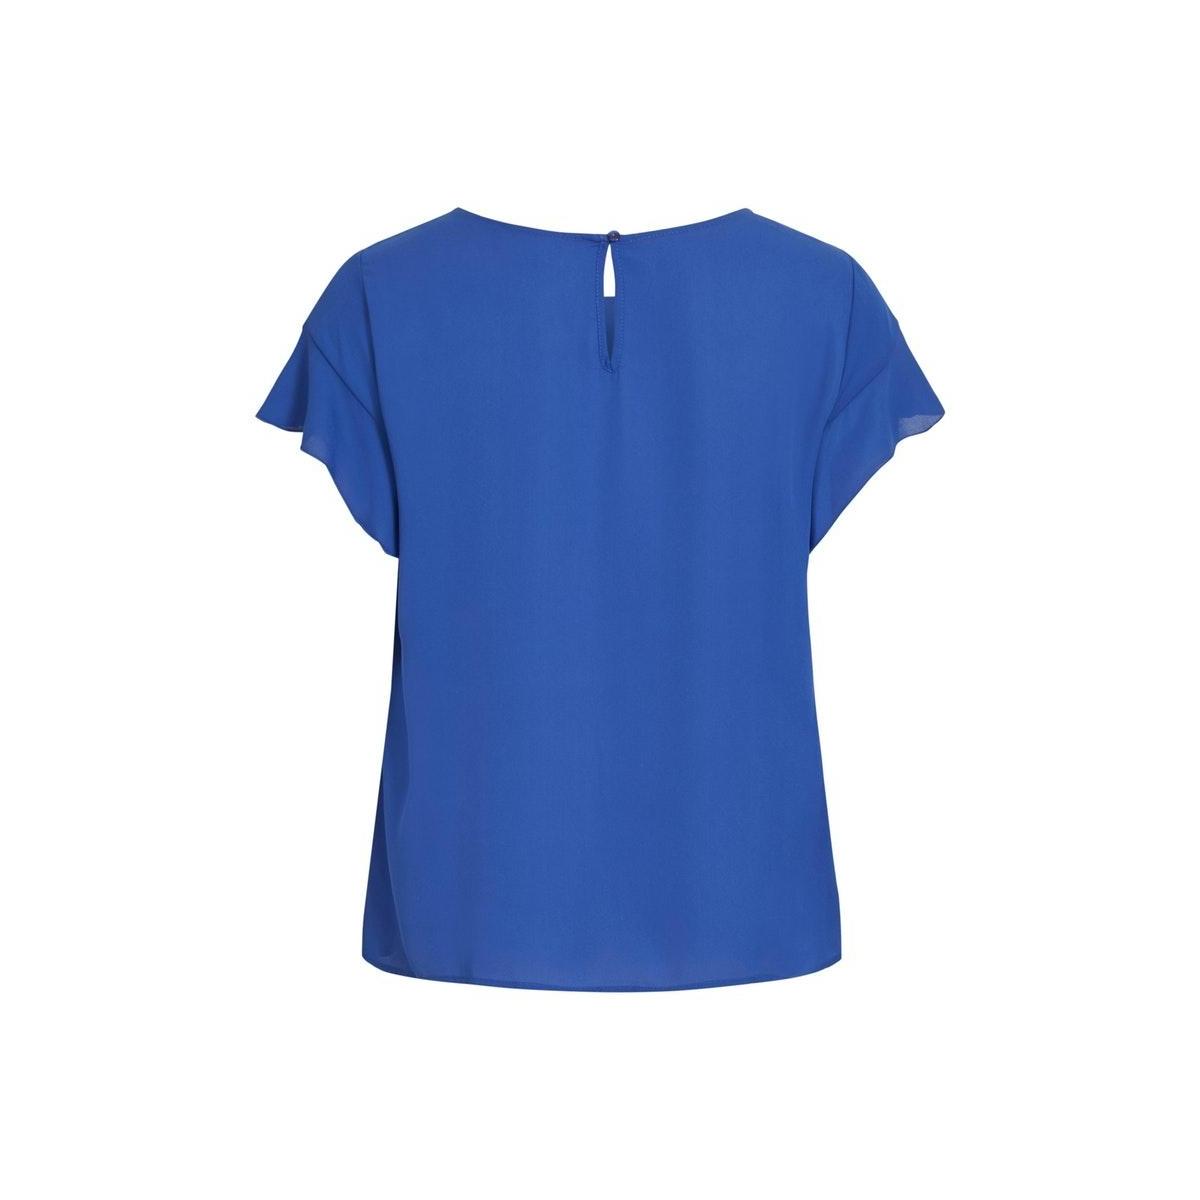 vilucy s/s flounce top - fav 14045856 vila t-shirt mazarine blue